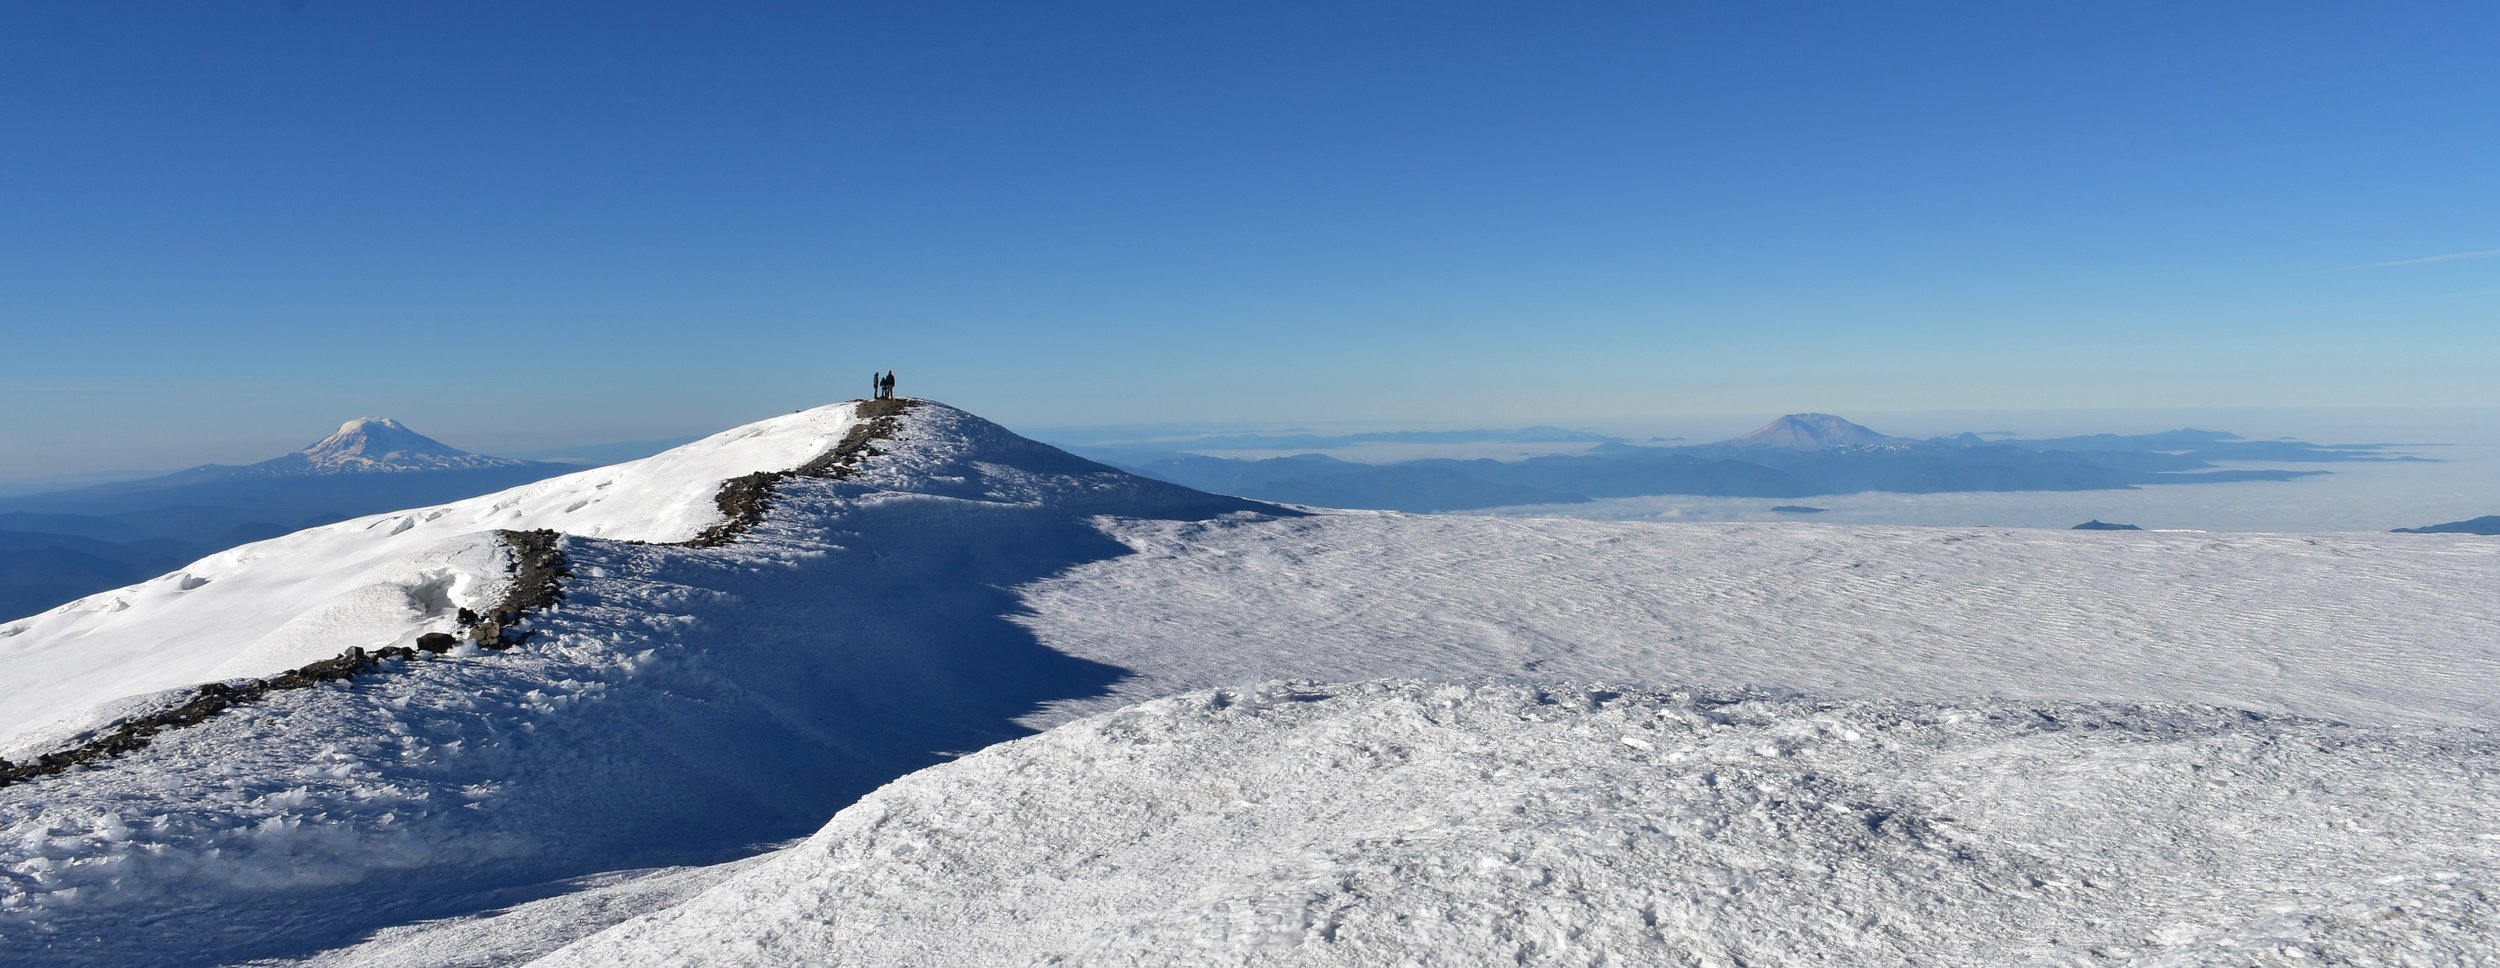 Adams->Rainier Summit->St. Helens